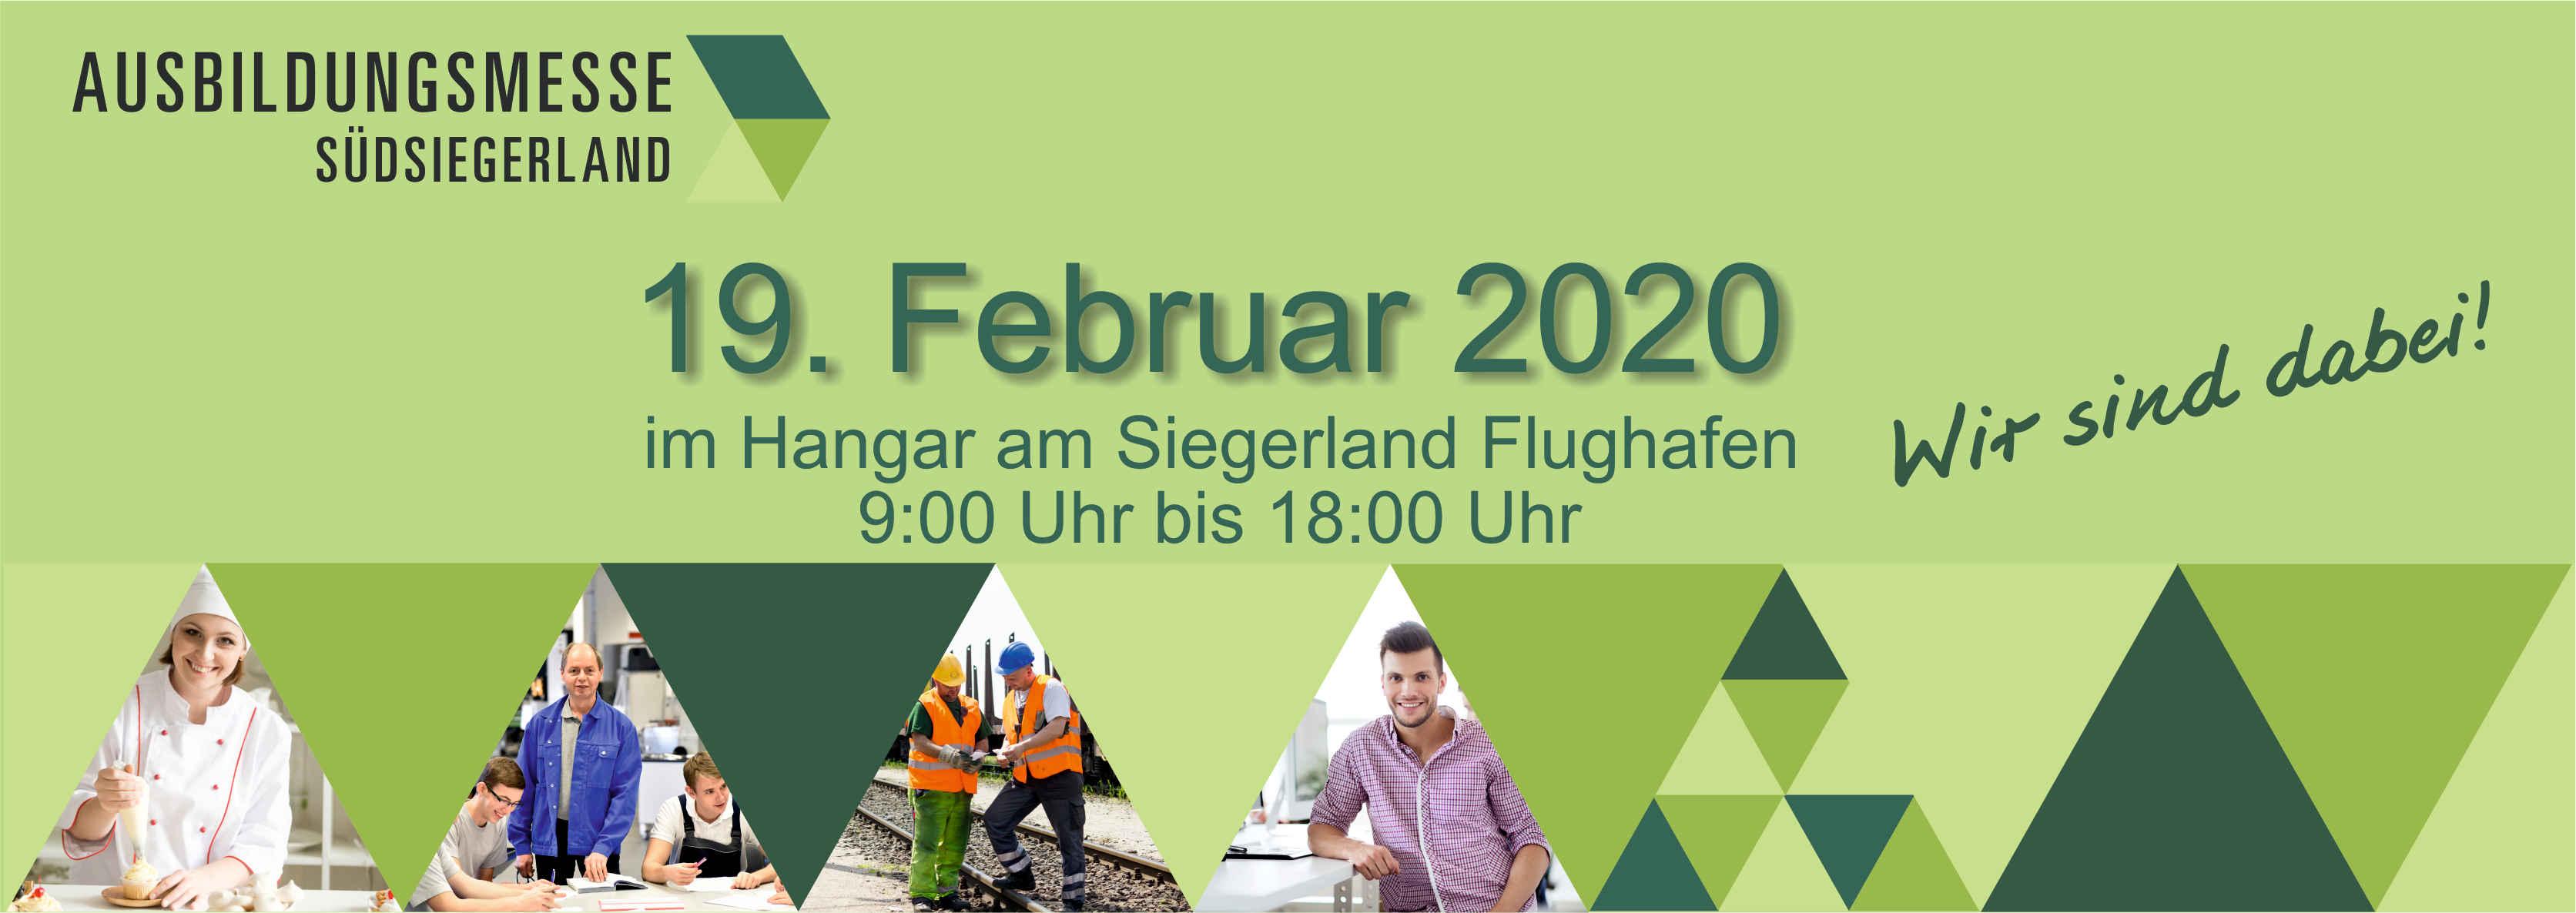 Ausbildungsmesse Südsiegerland 2020